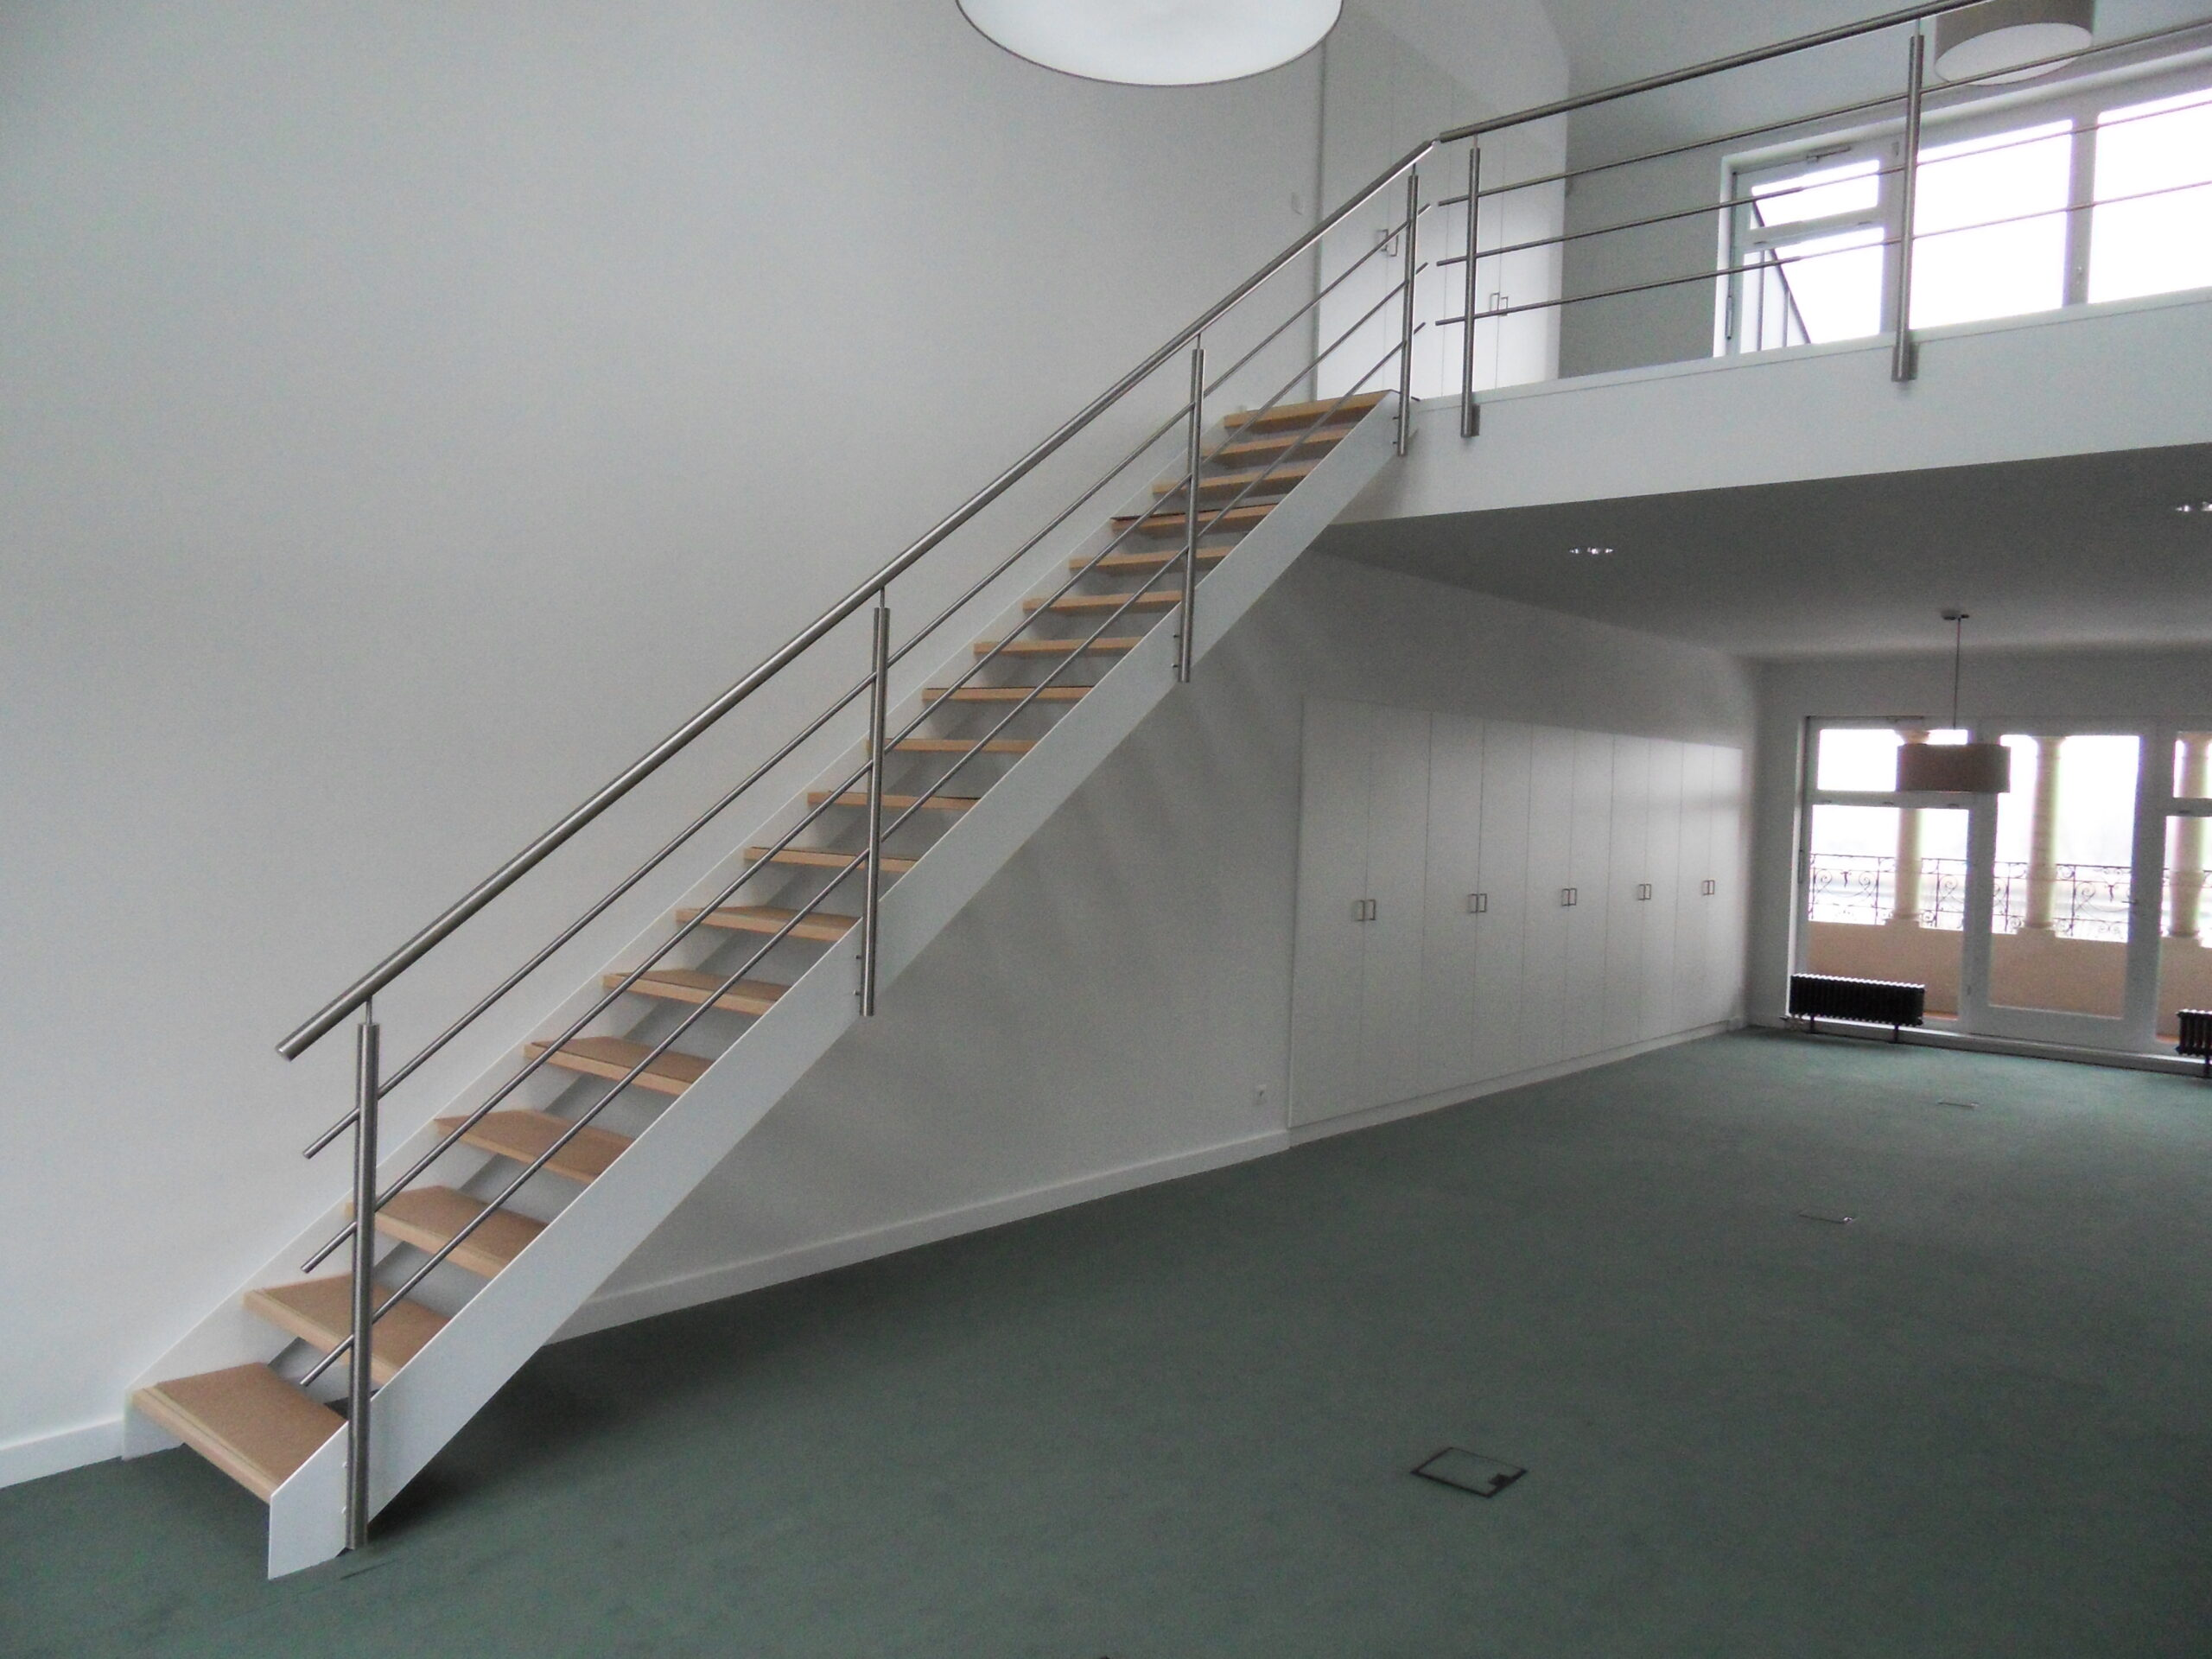 Trappen op maat al las metalen ijzeren aluminium trappen